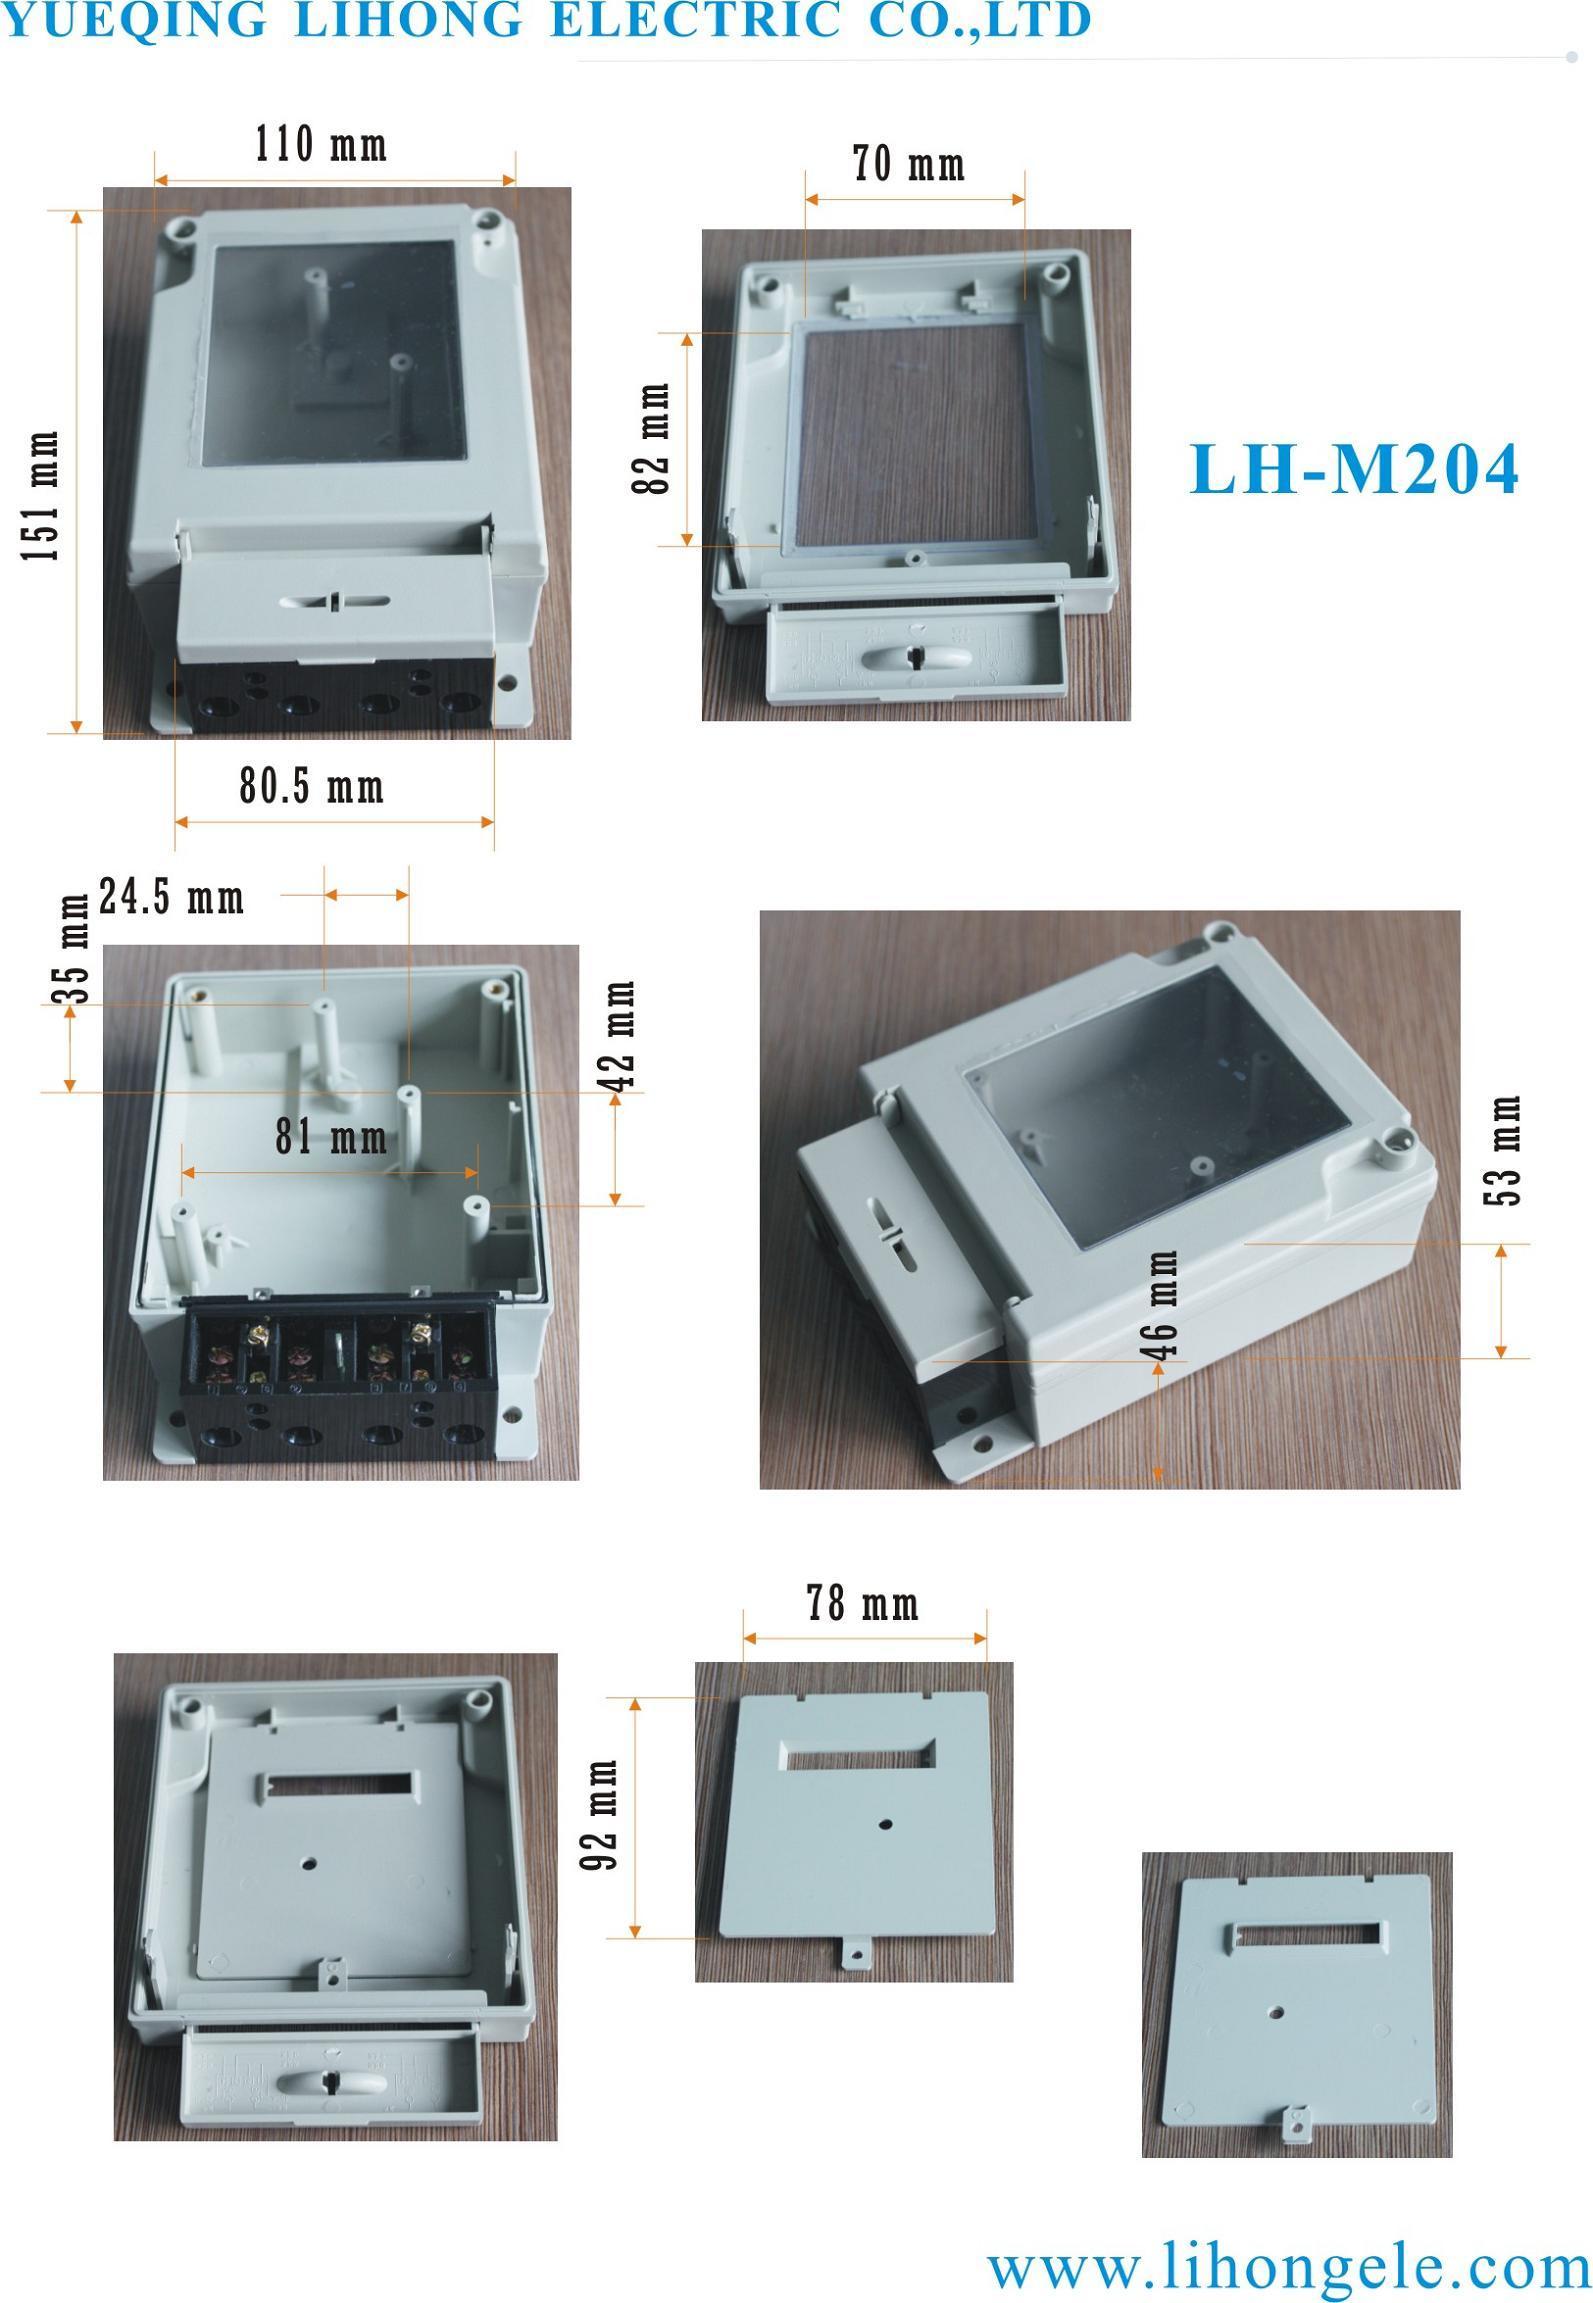 ABS Single Phase Energy Meter Case, Electric Meter Housing (LH-M204)